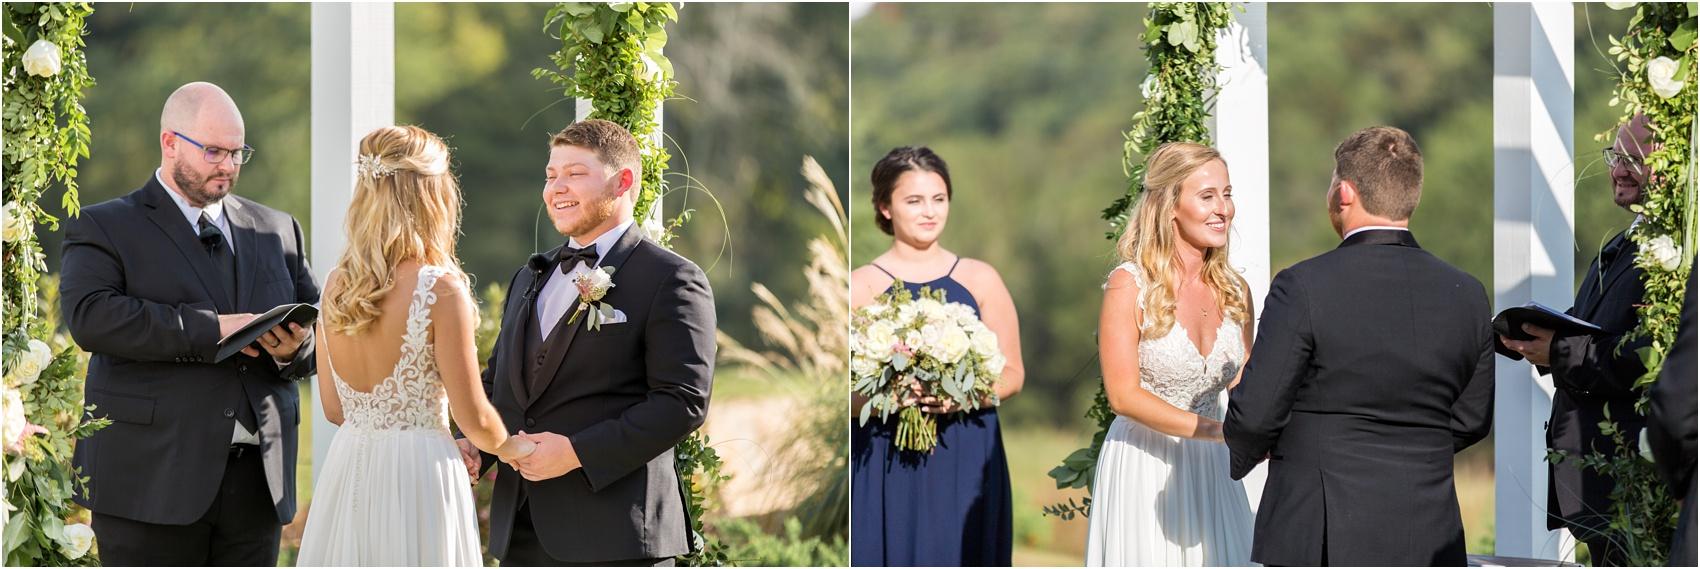 Savannah Eve Photography- Jurek-Woodworth Wedding- Sneak Peek-40.jpg